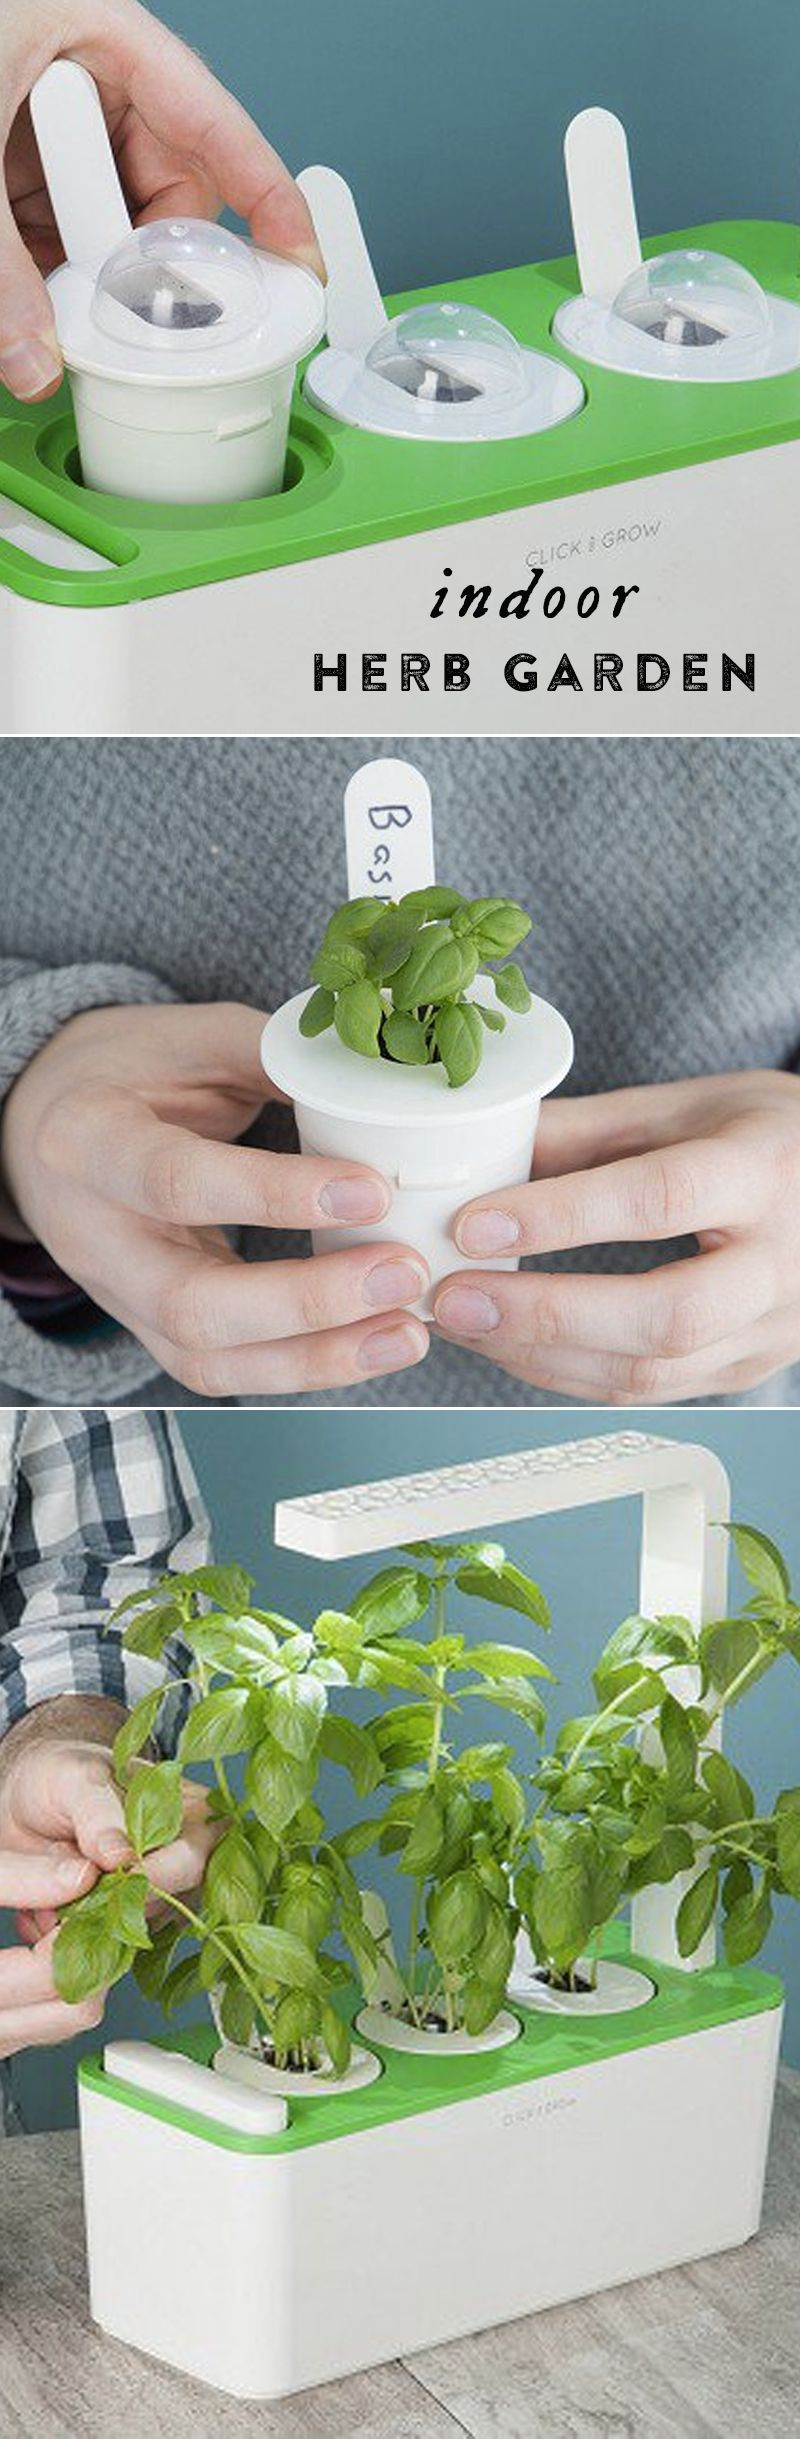 Grow An Herb Garden Indoors—With No Guesswork Or Sunlight 400 x 300